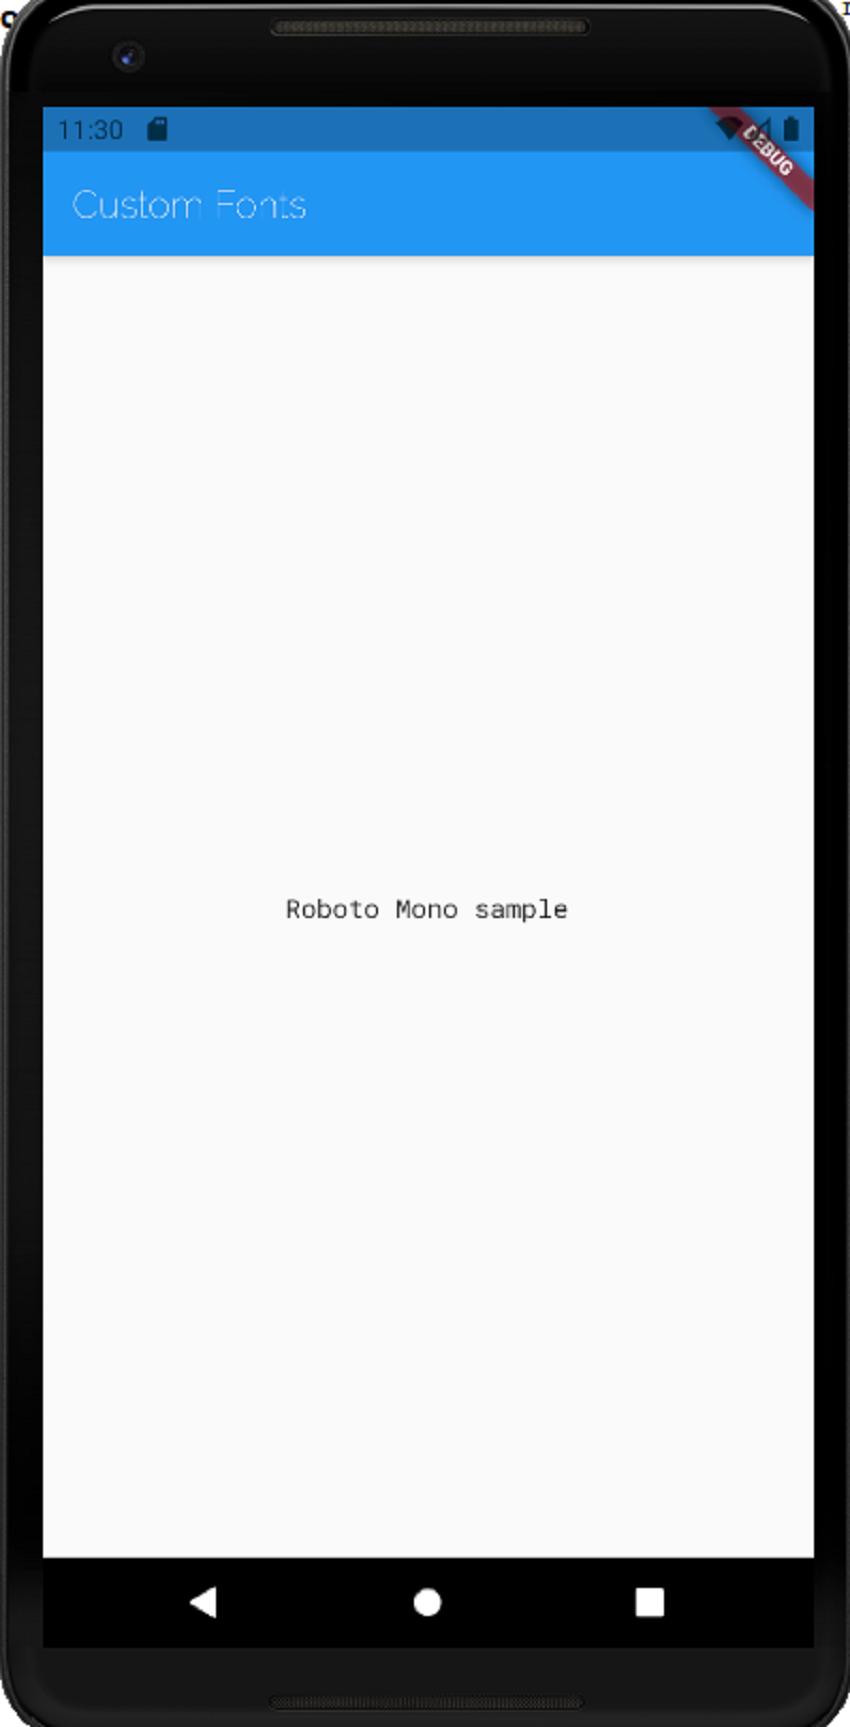 Flutter app with Roboto Mono font